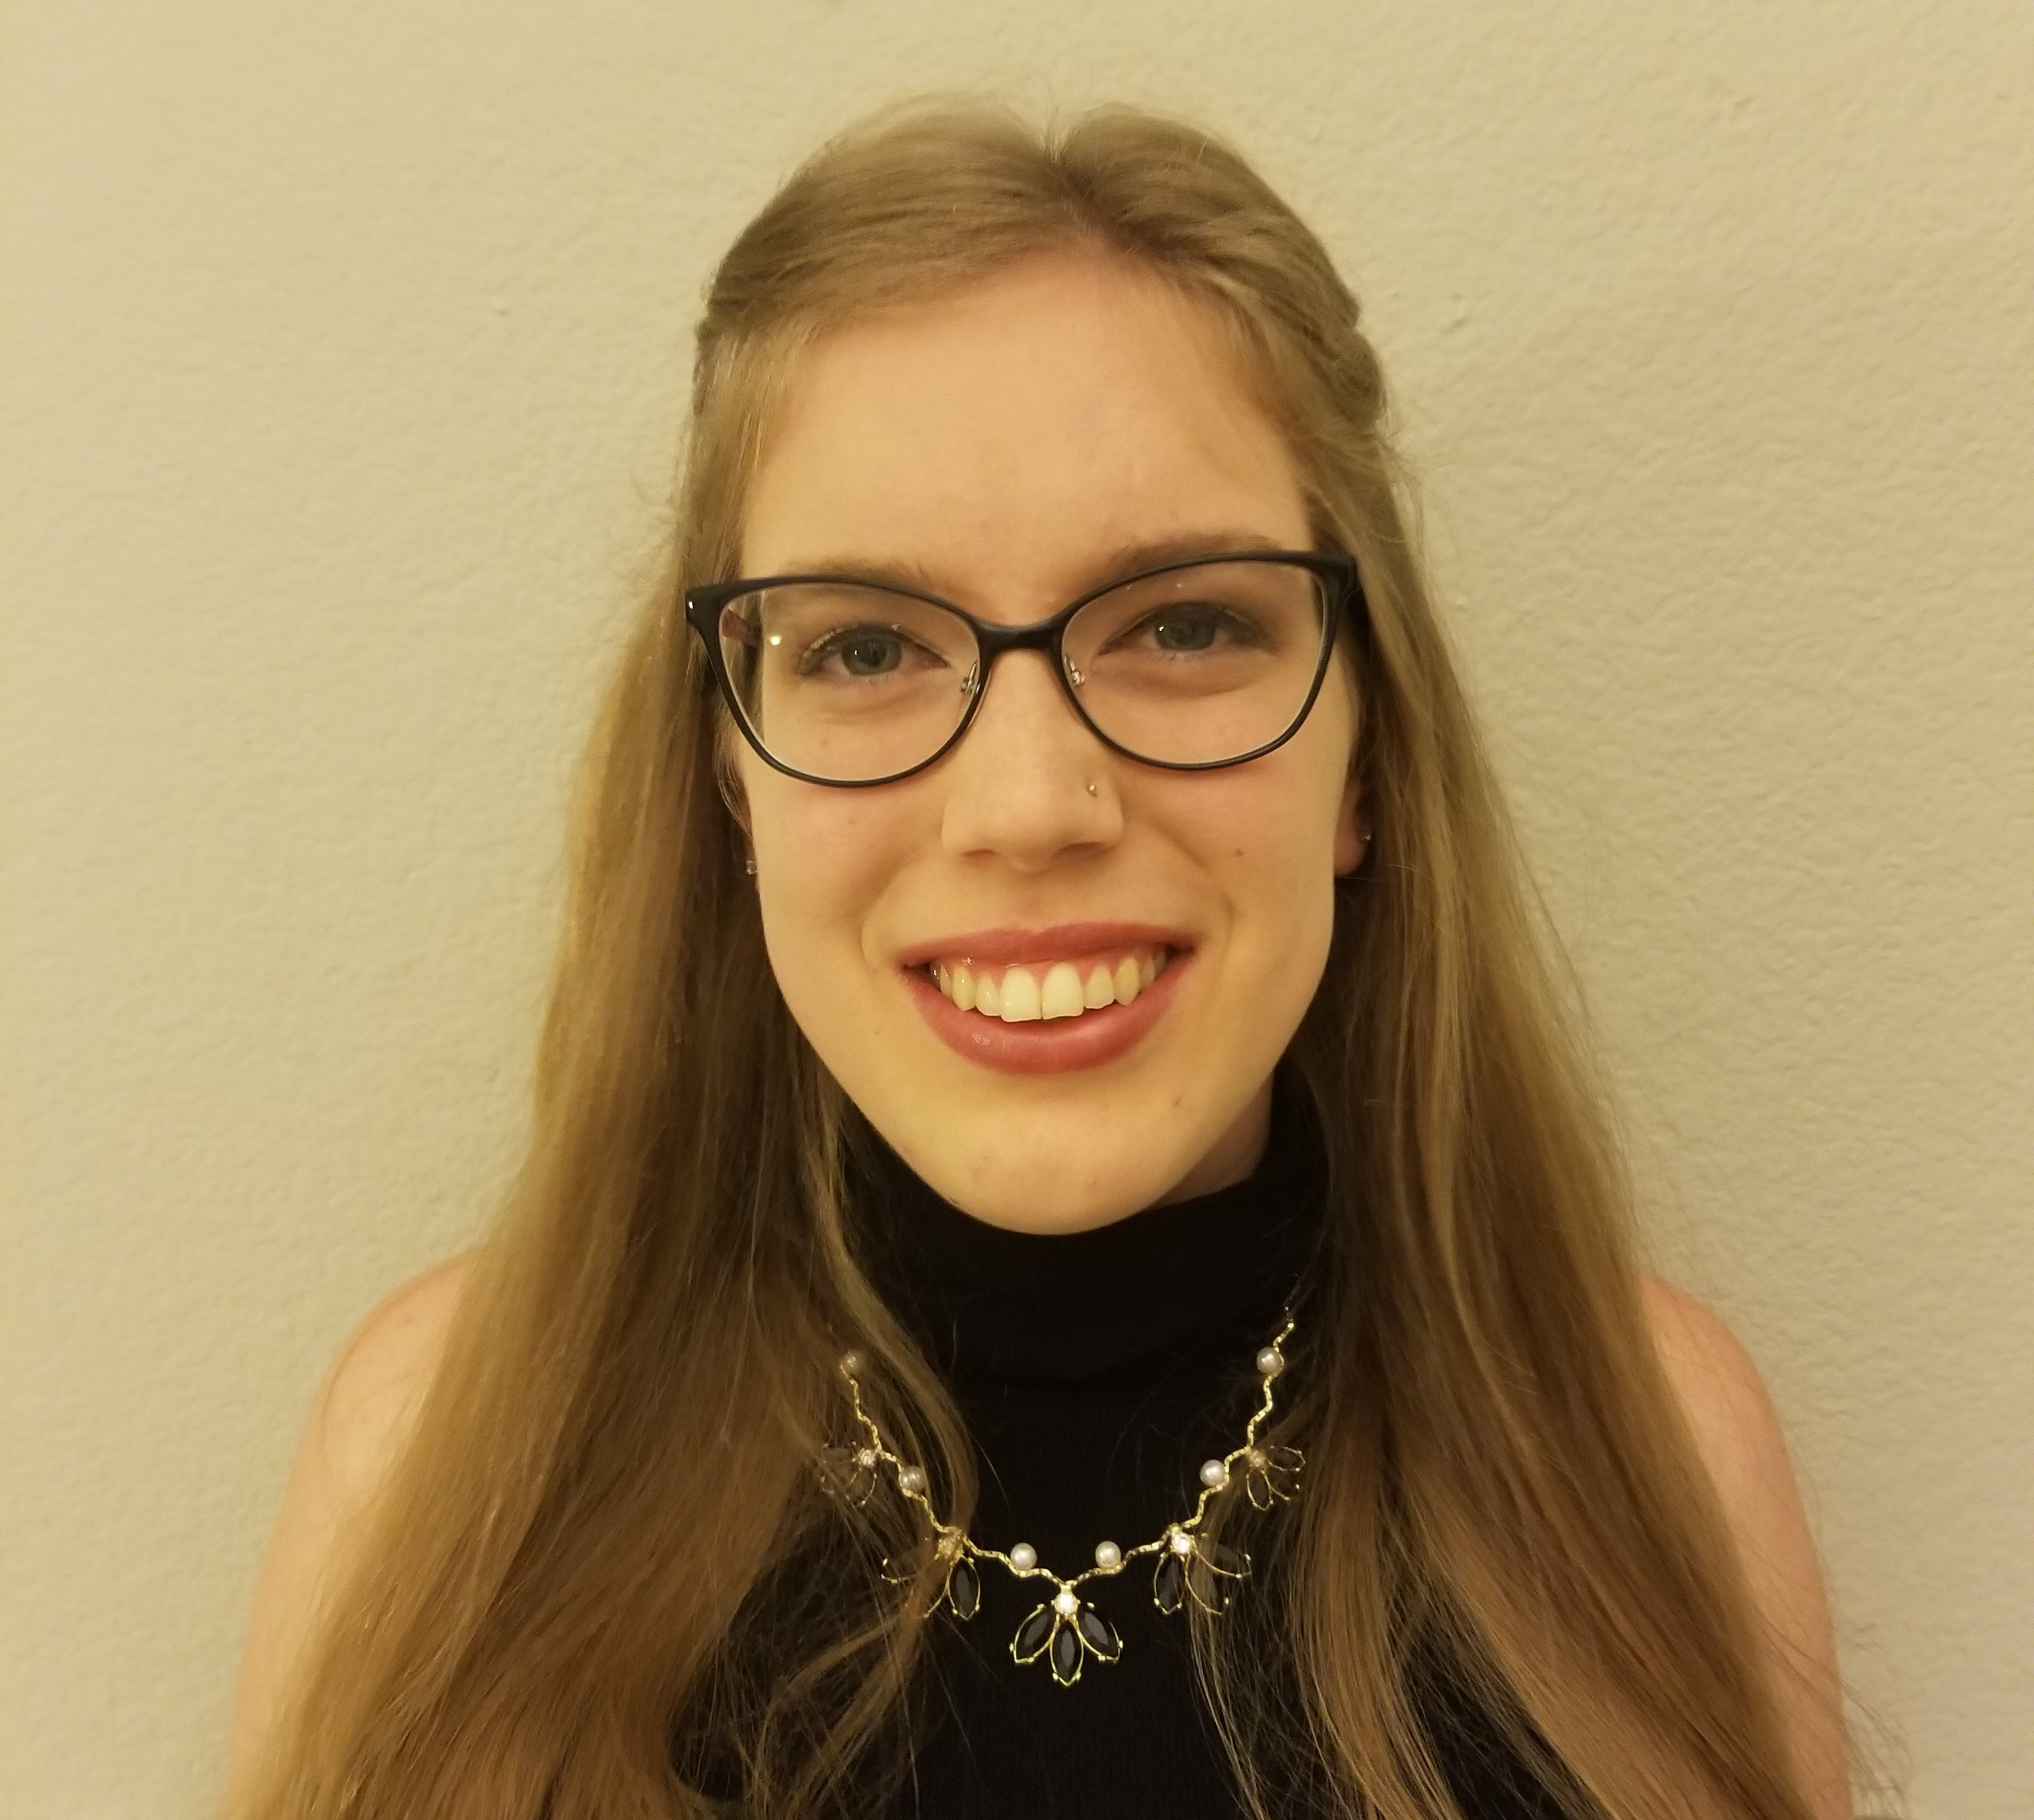 Karissa Beran – 2017 Scholar